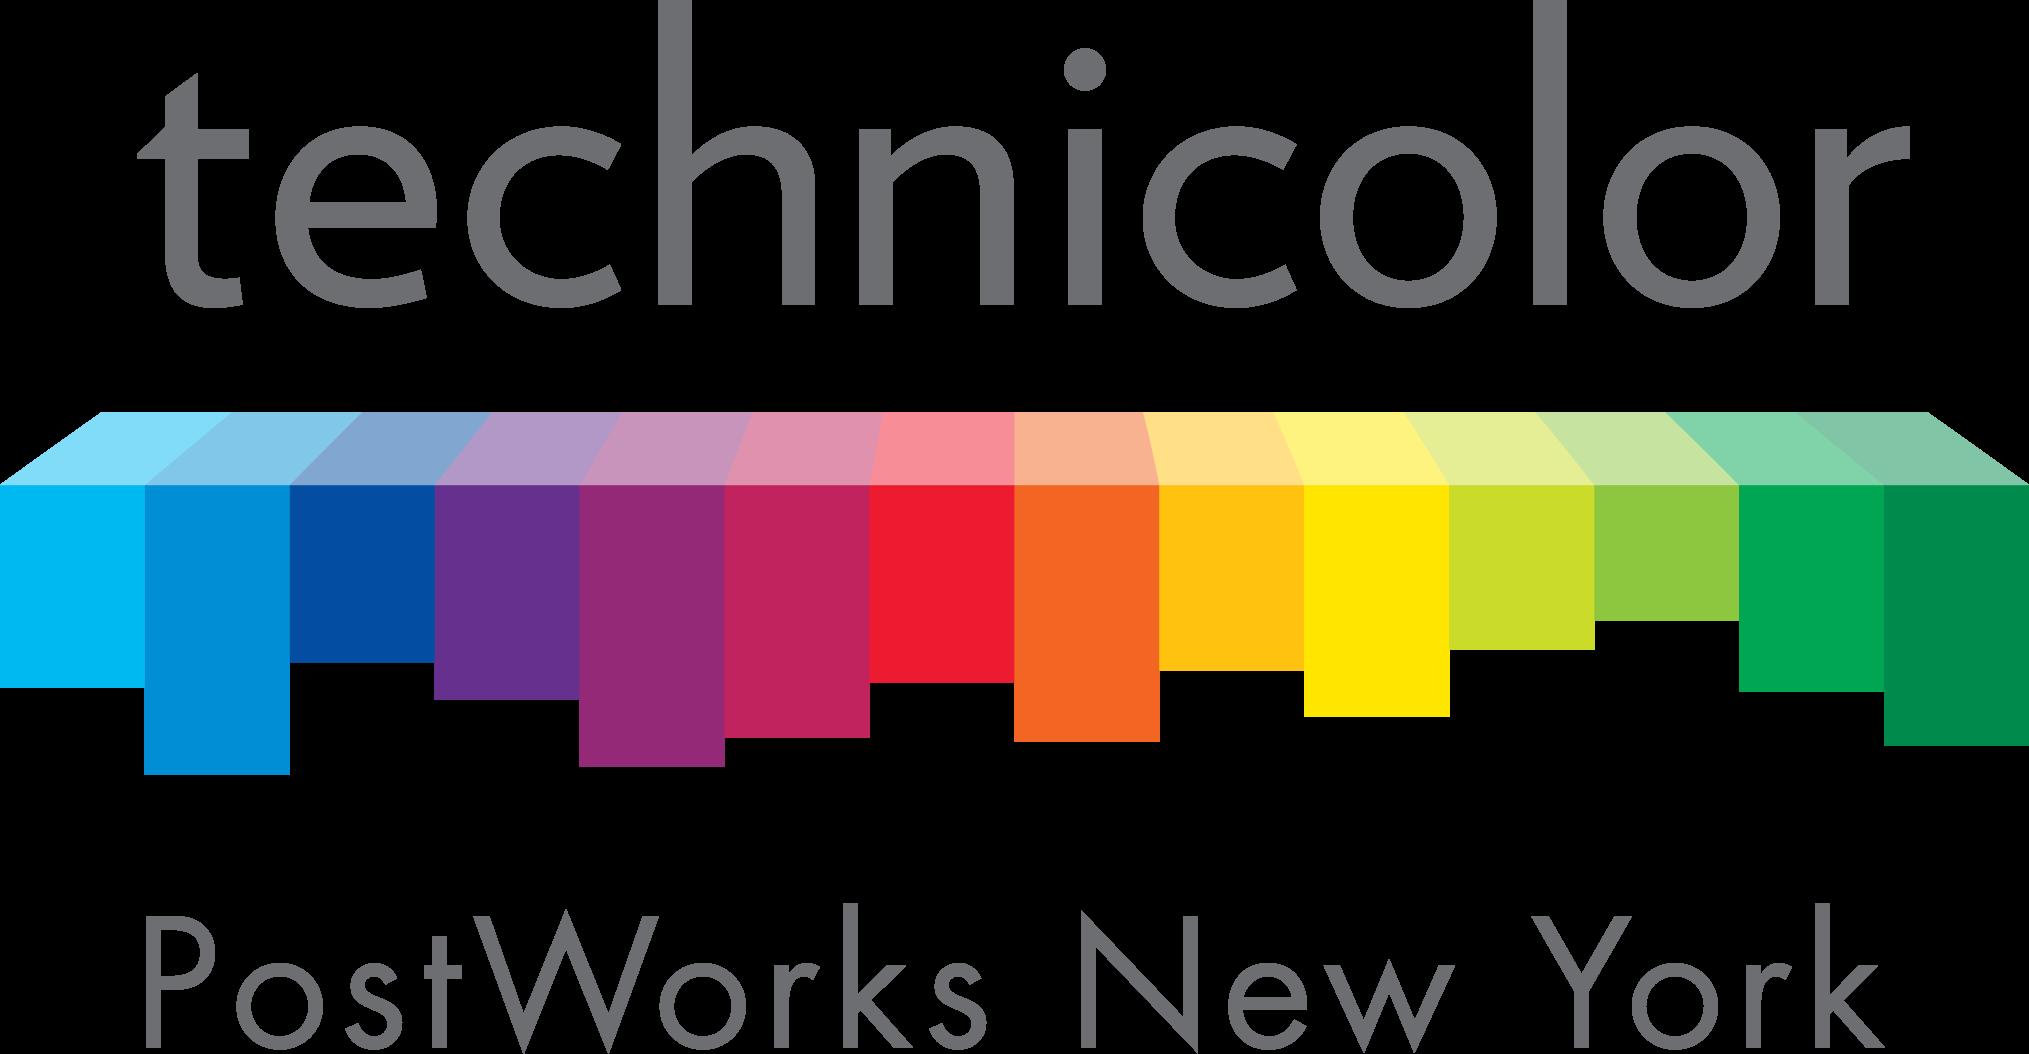 Technicolor Logo.png